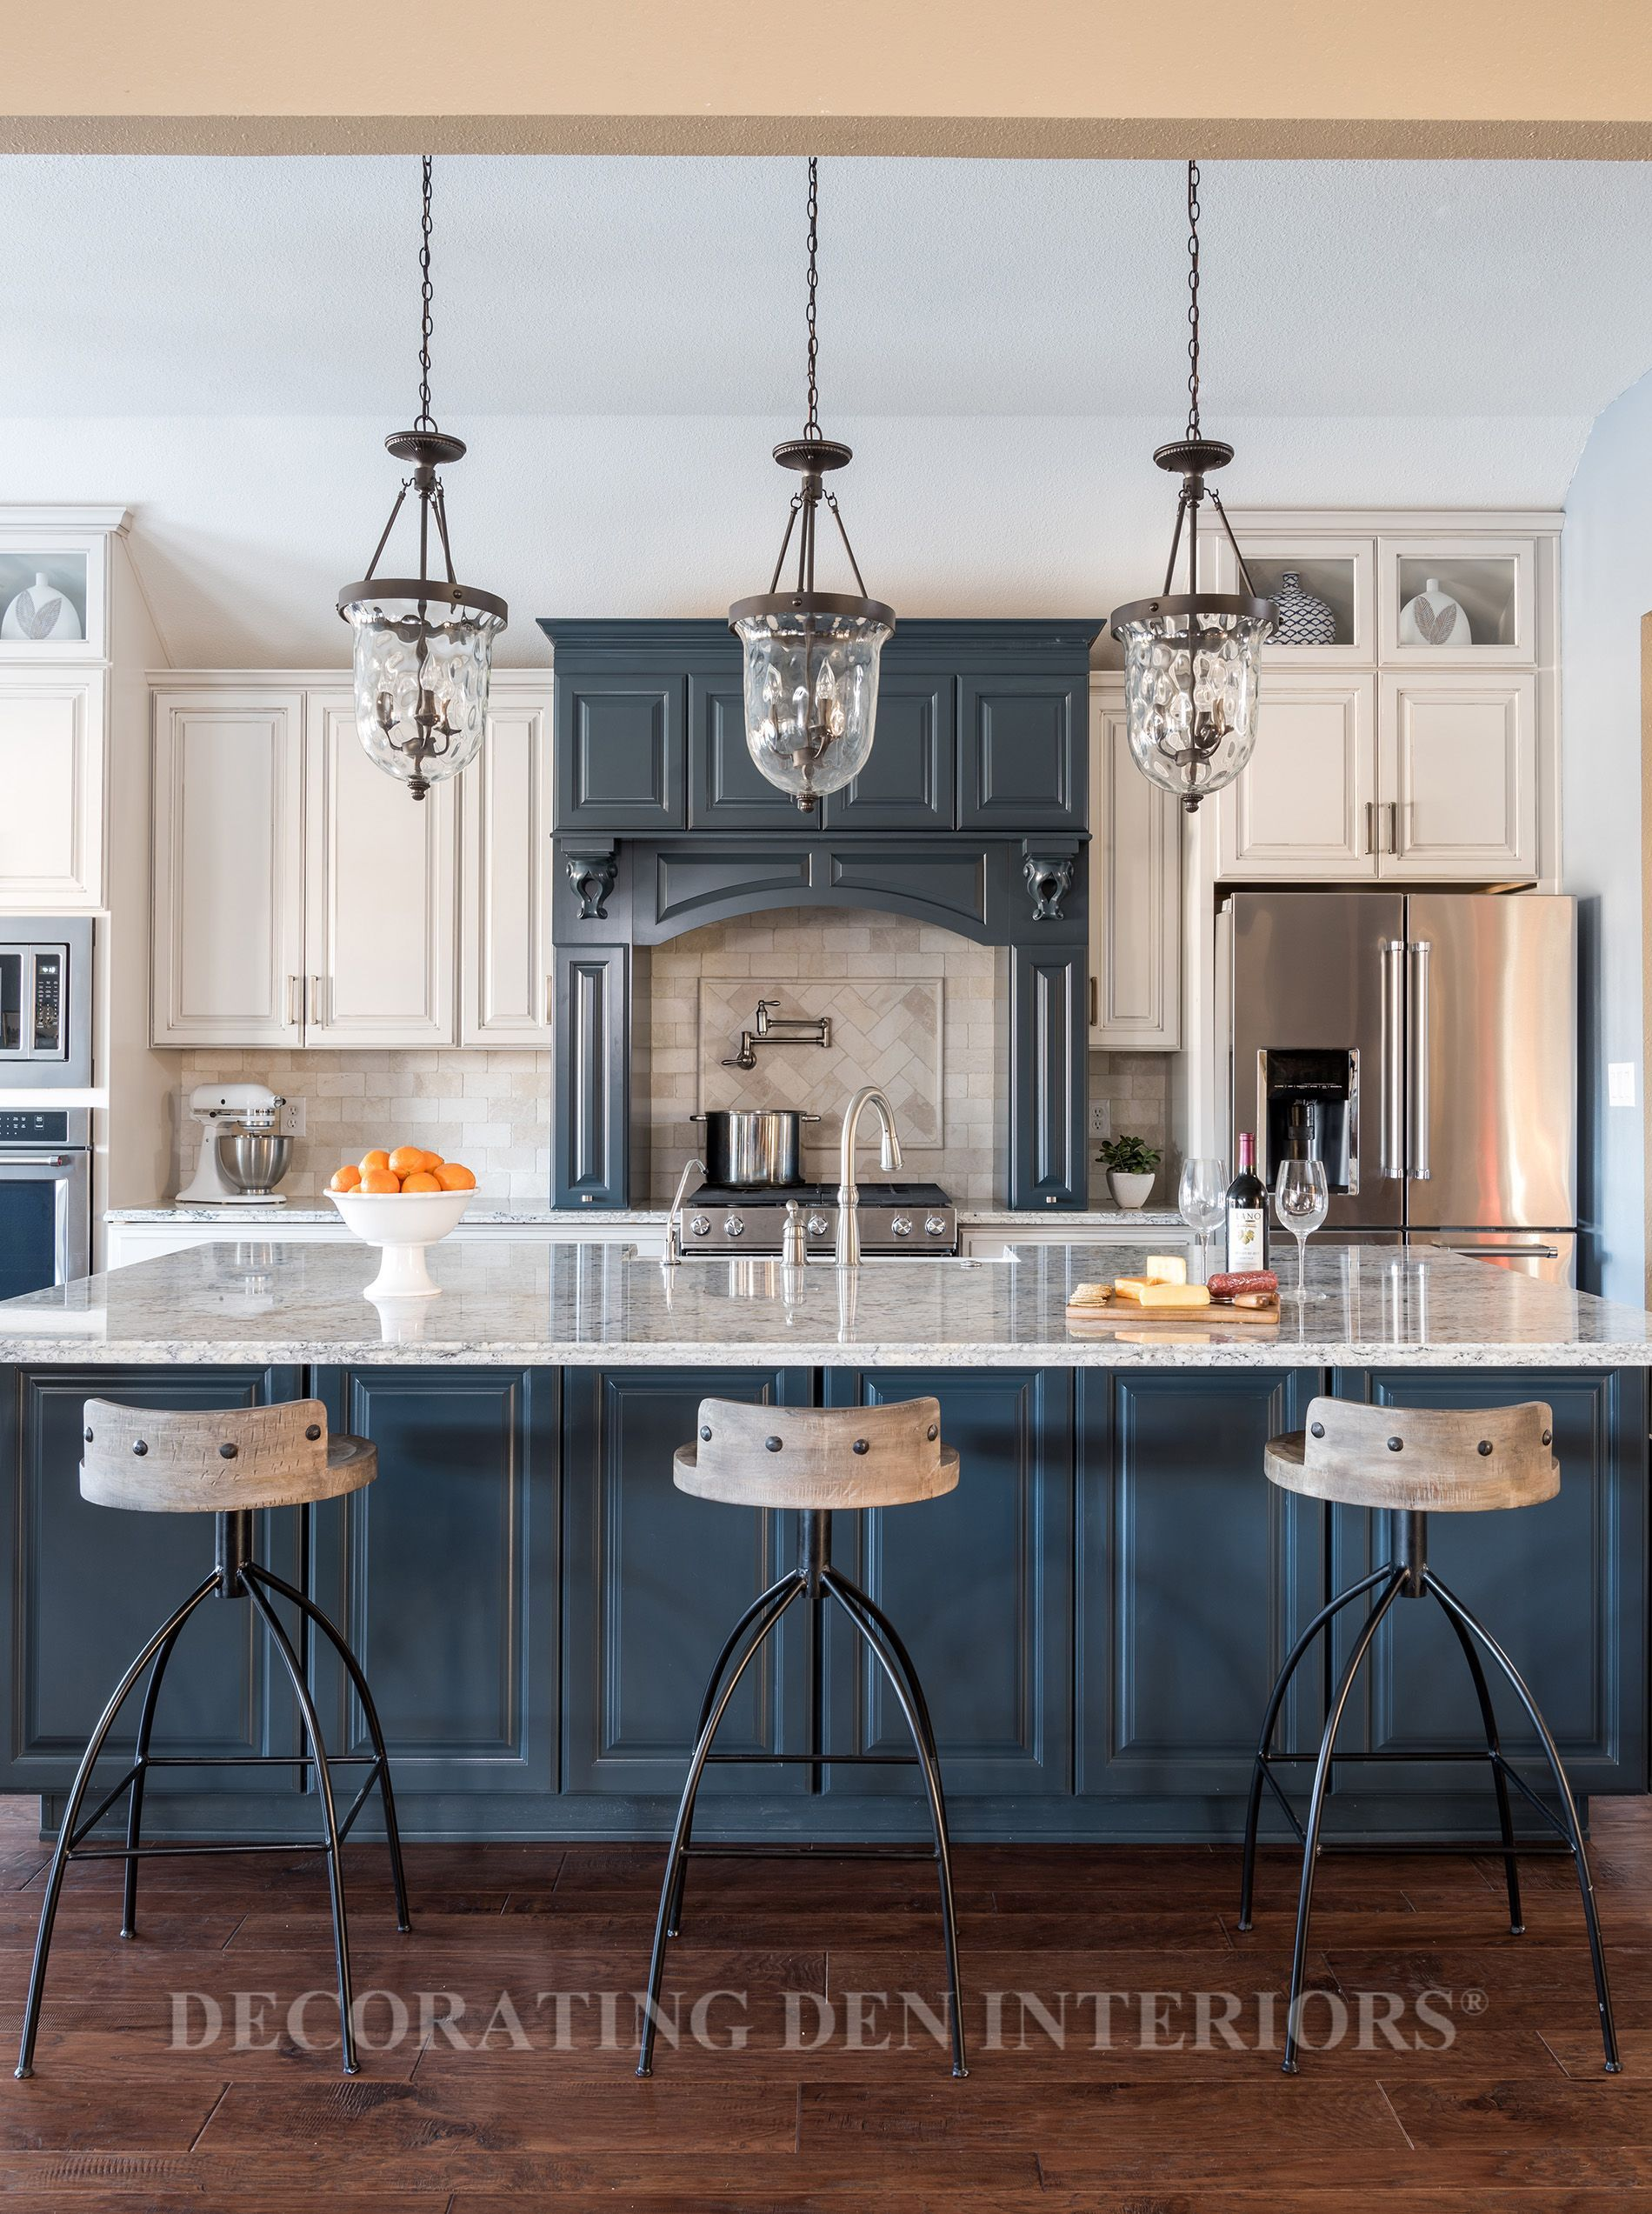 Modern Farmhouse Interior Designer Decorating Den Twin